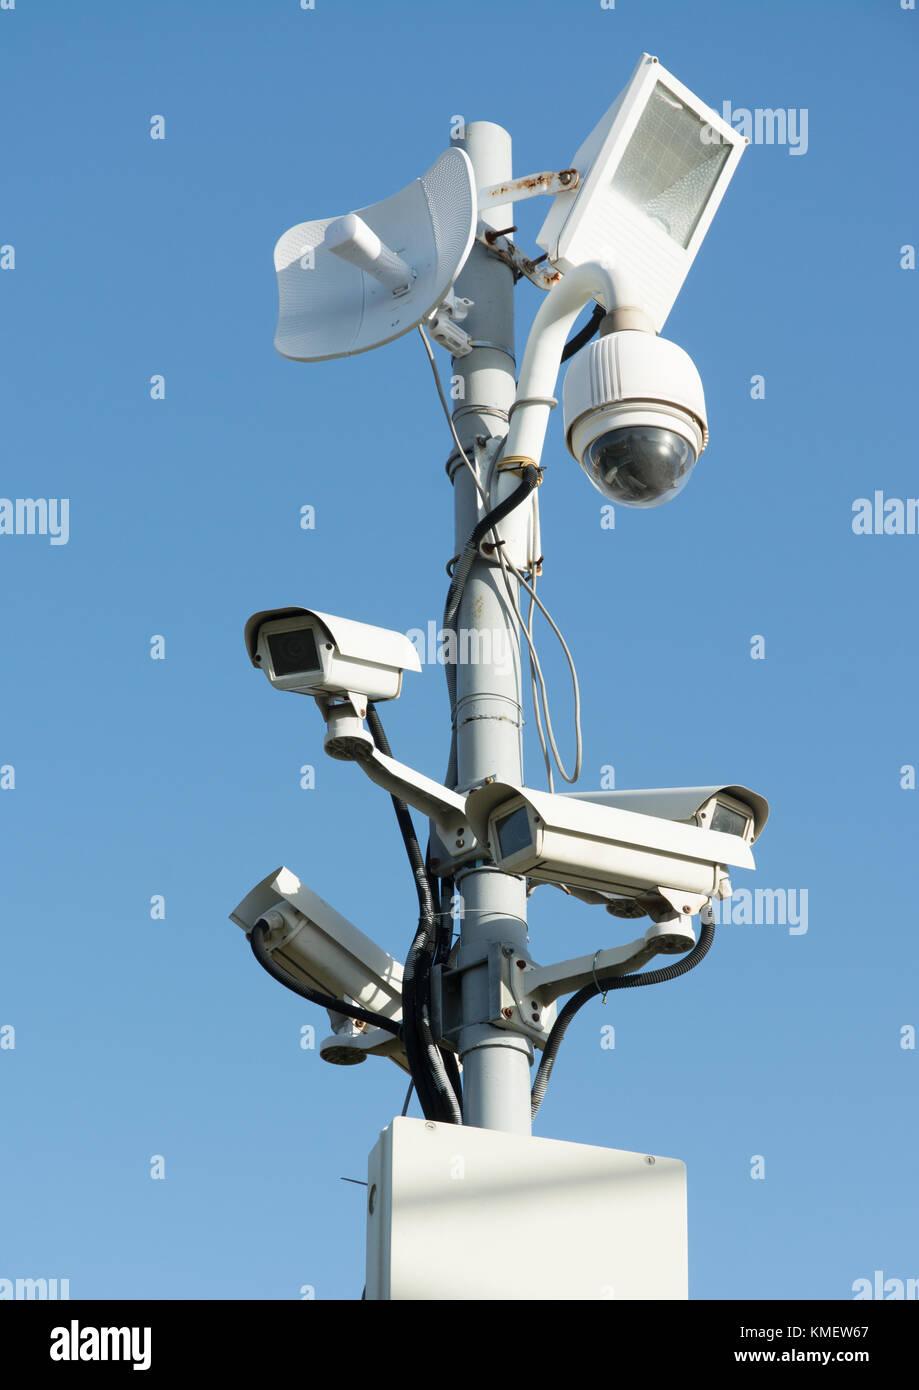 Security cameras - Stock Image